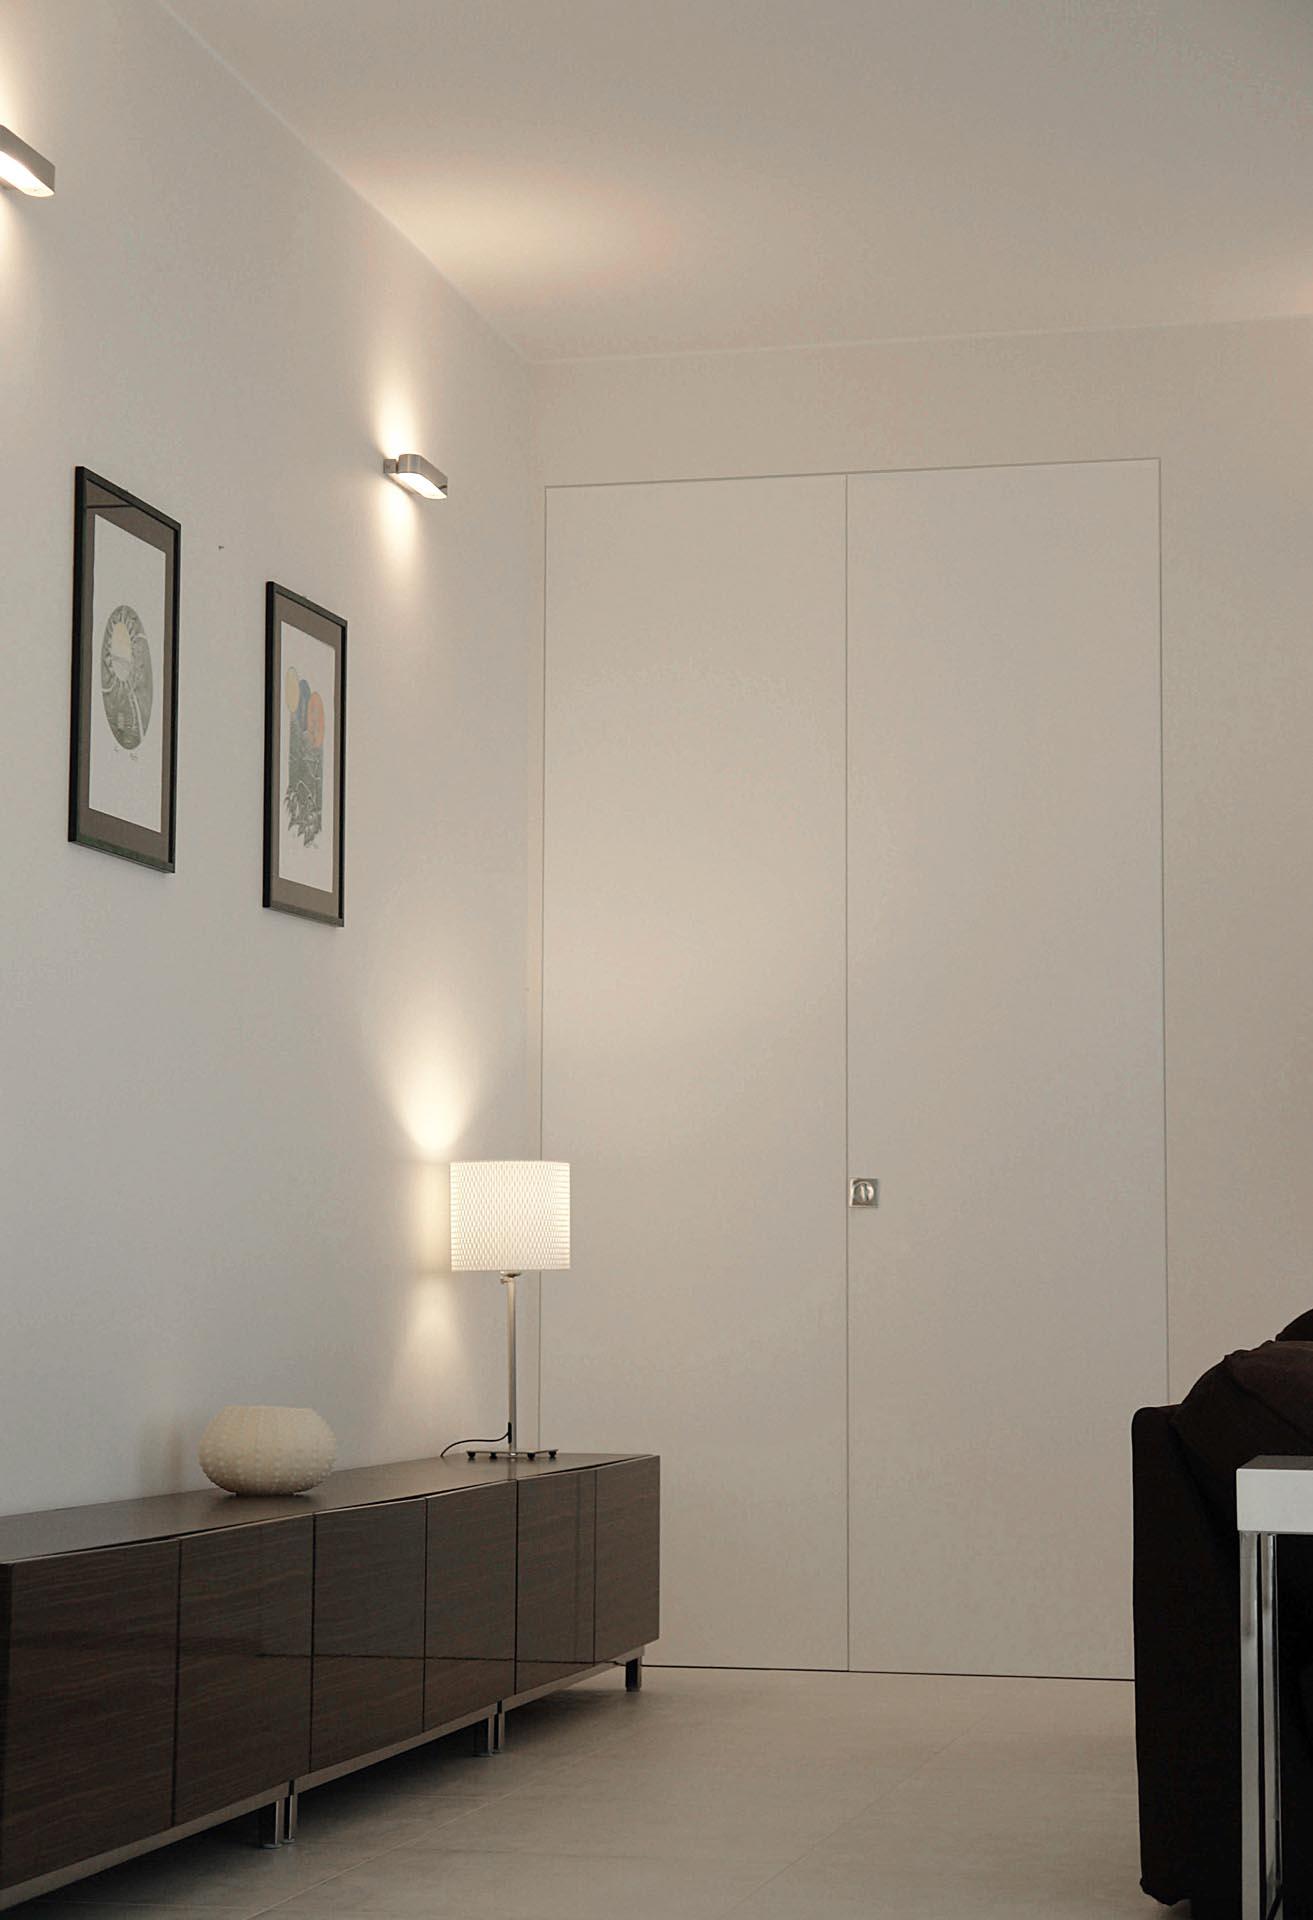 Wandbündige Türe zum Drücken - Evoline3